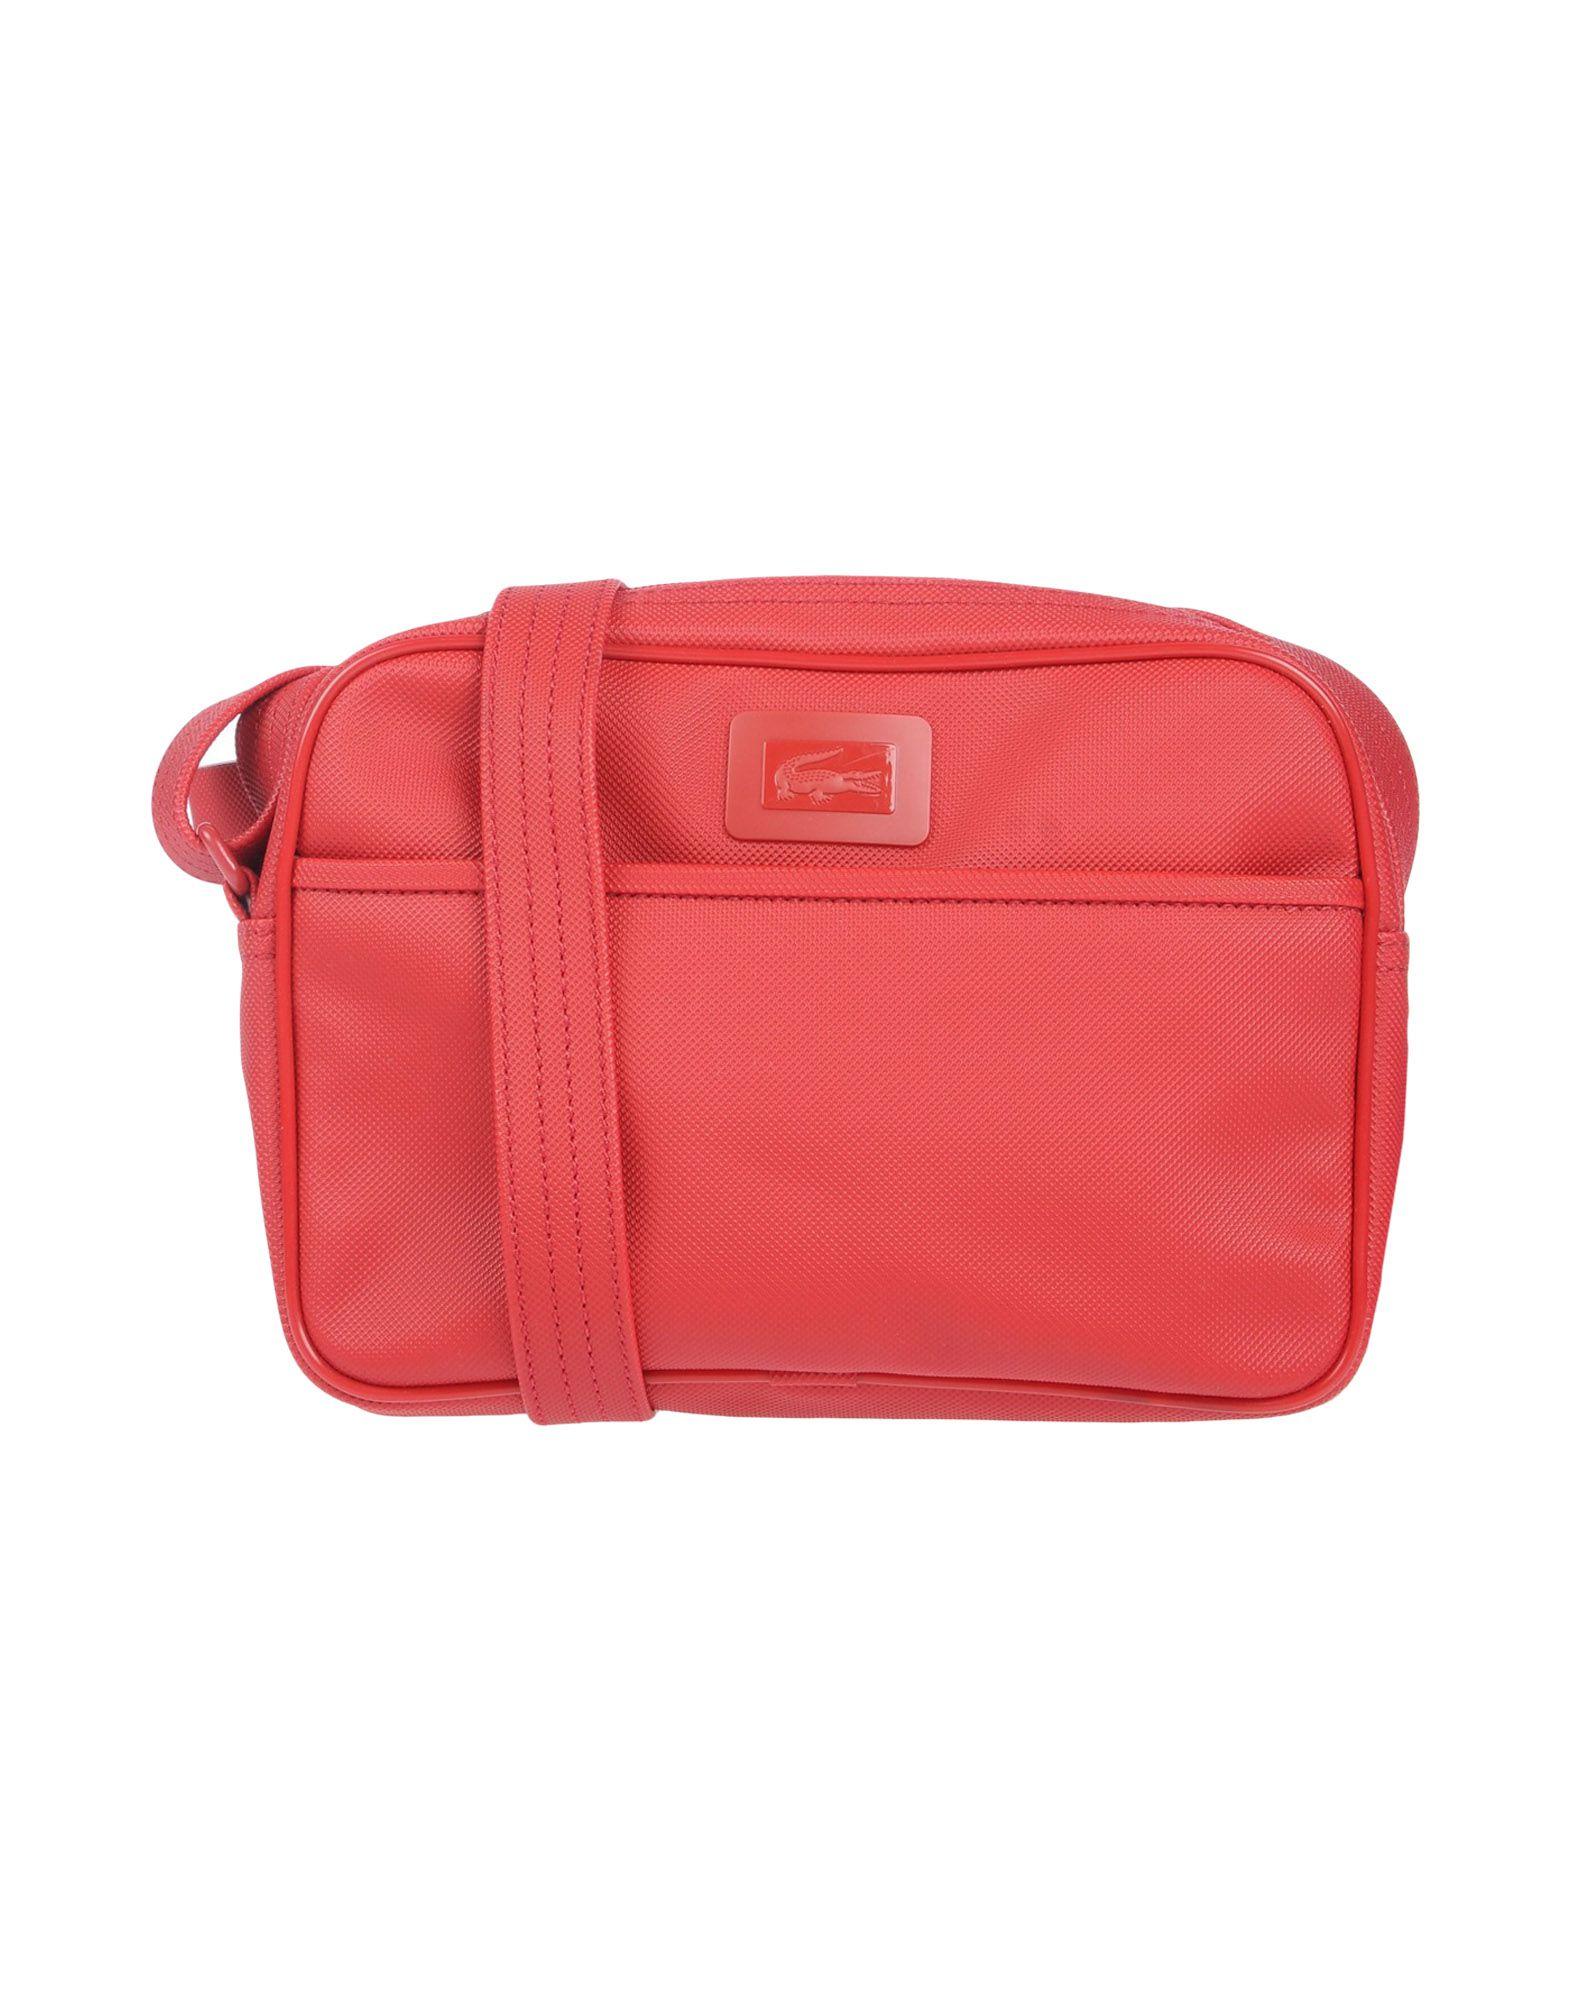 LACOSTE Сумка через плечо сумка lacoste nf1887po141t00